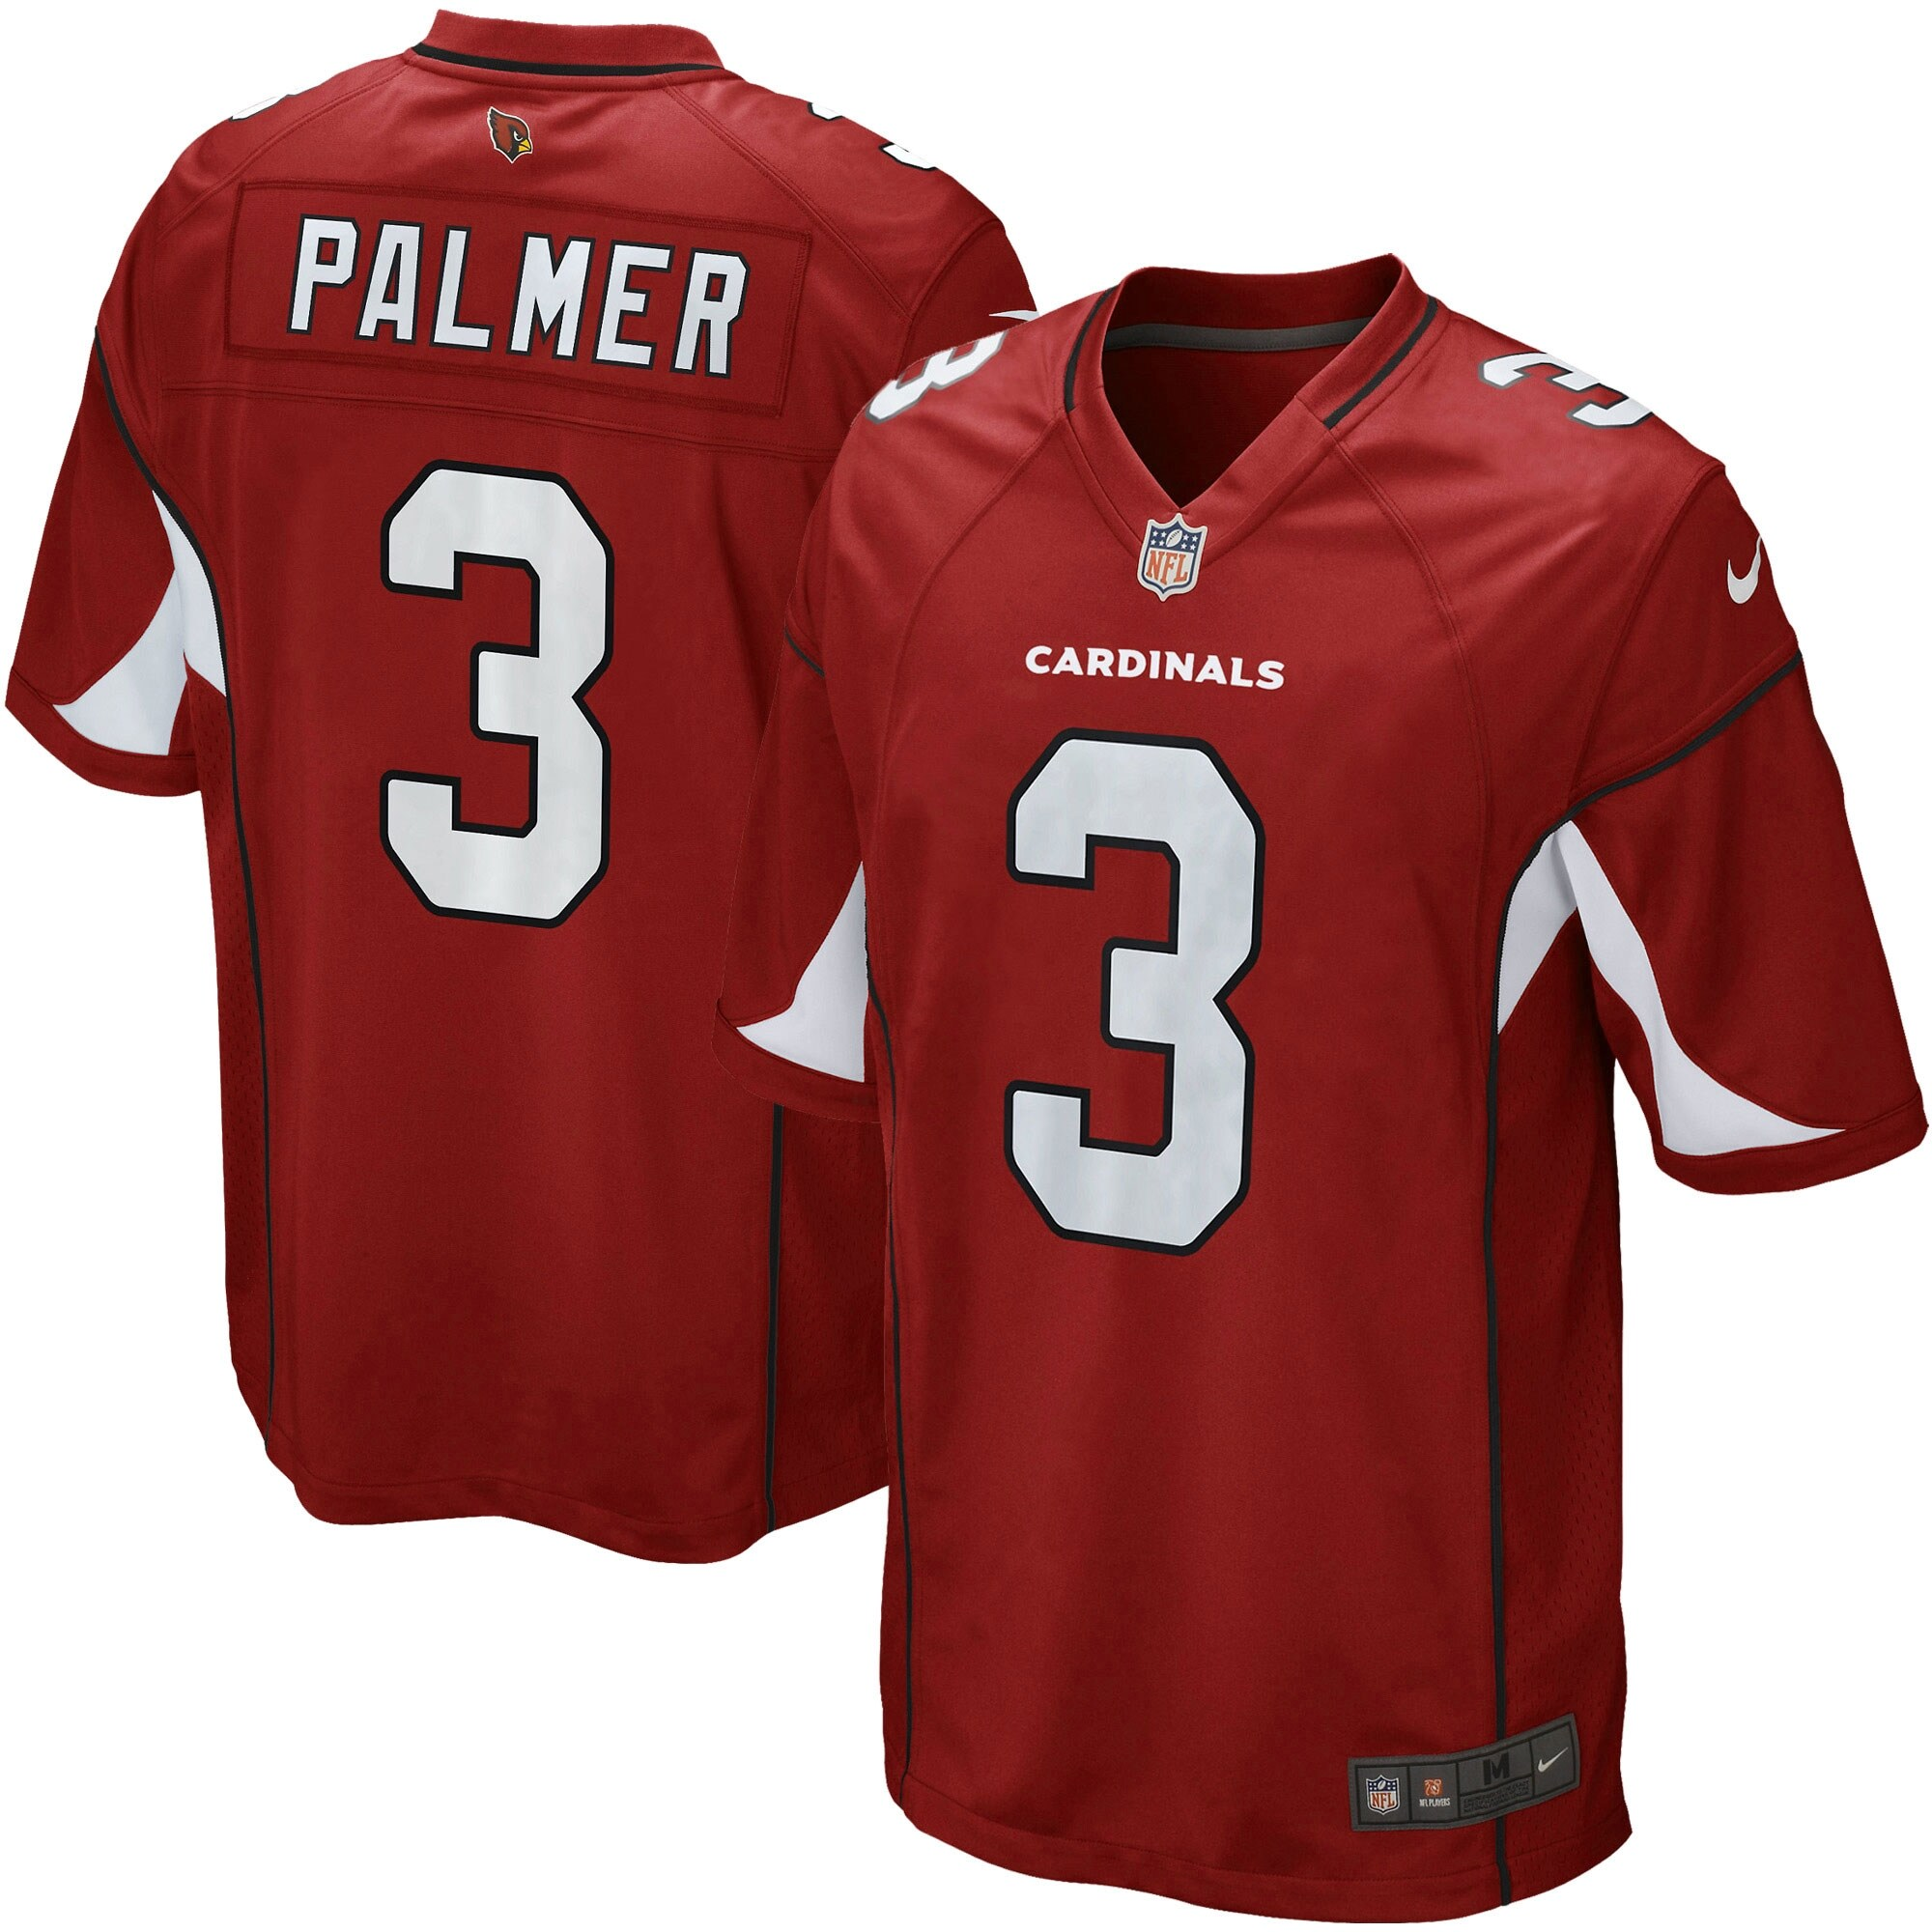 Carson Palmer Arizona Cardinals Nike Youth Team Color Game Jersey - Cardinal